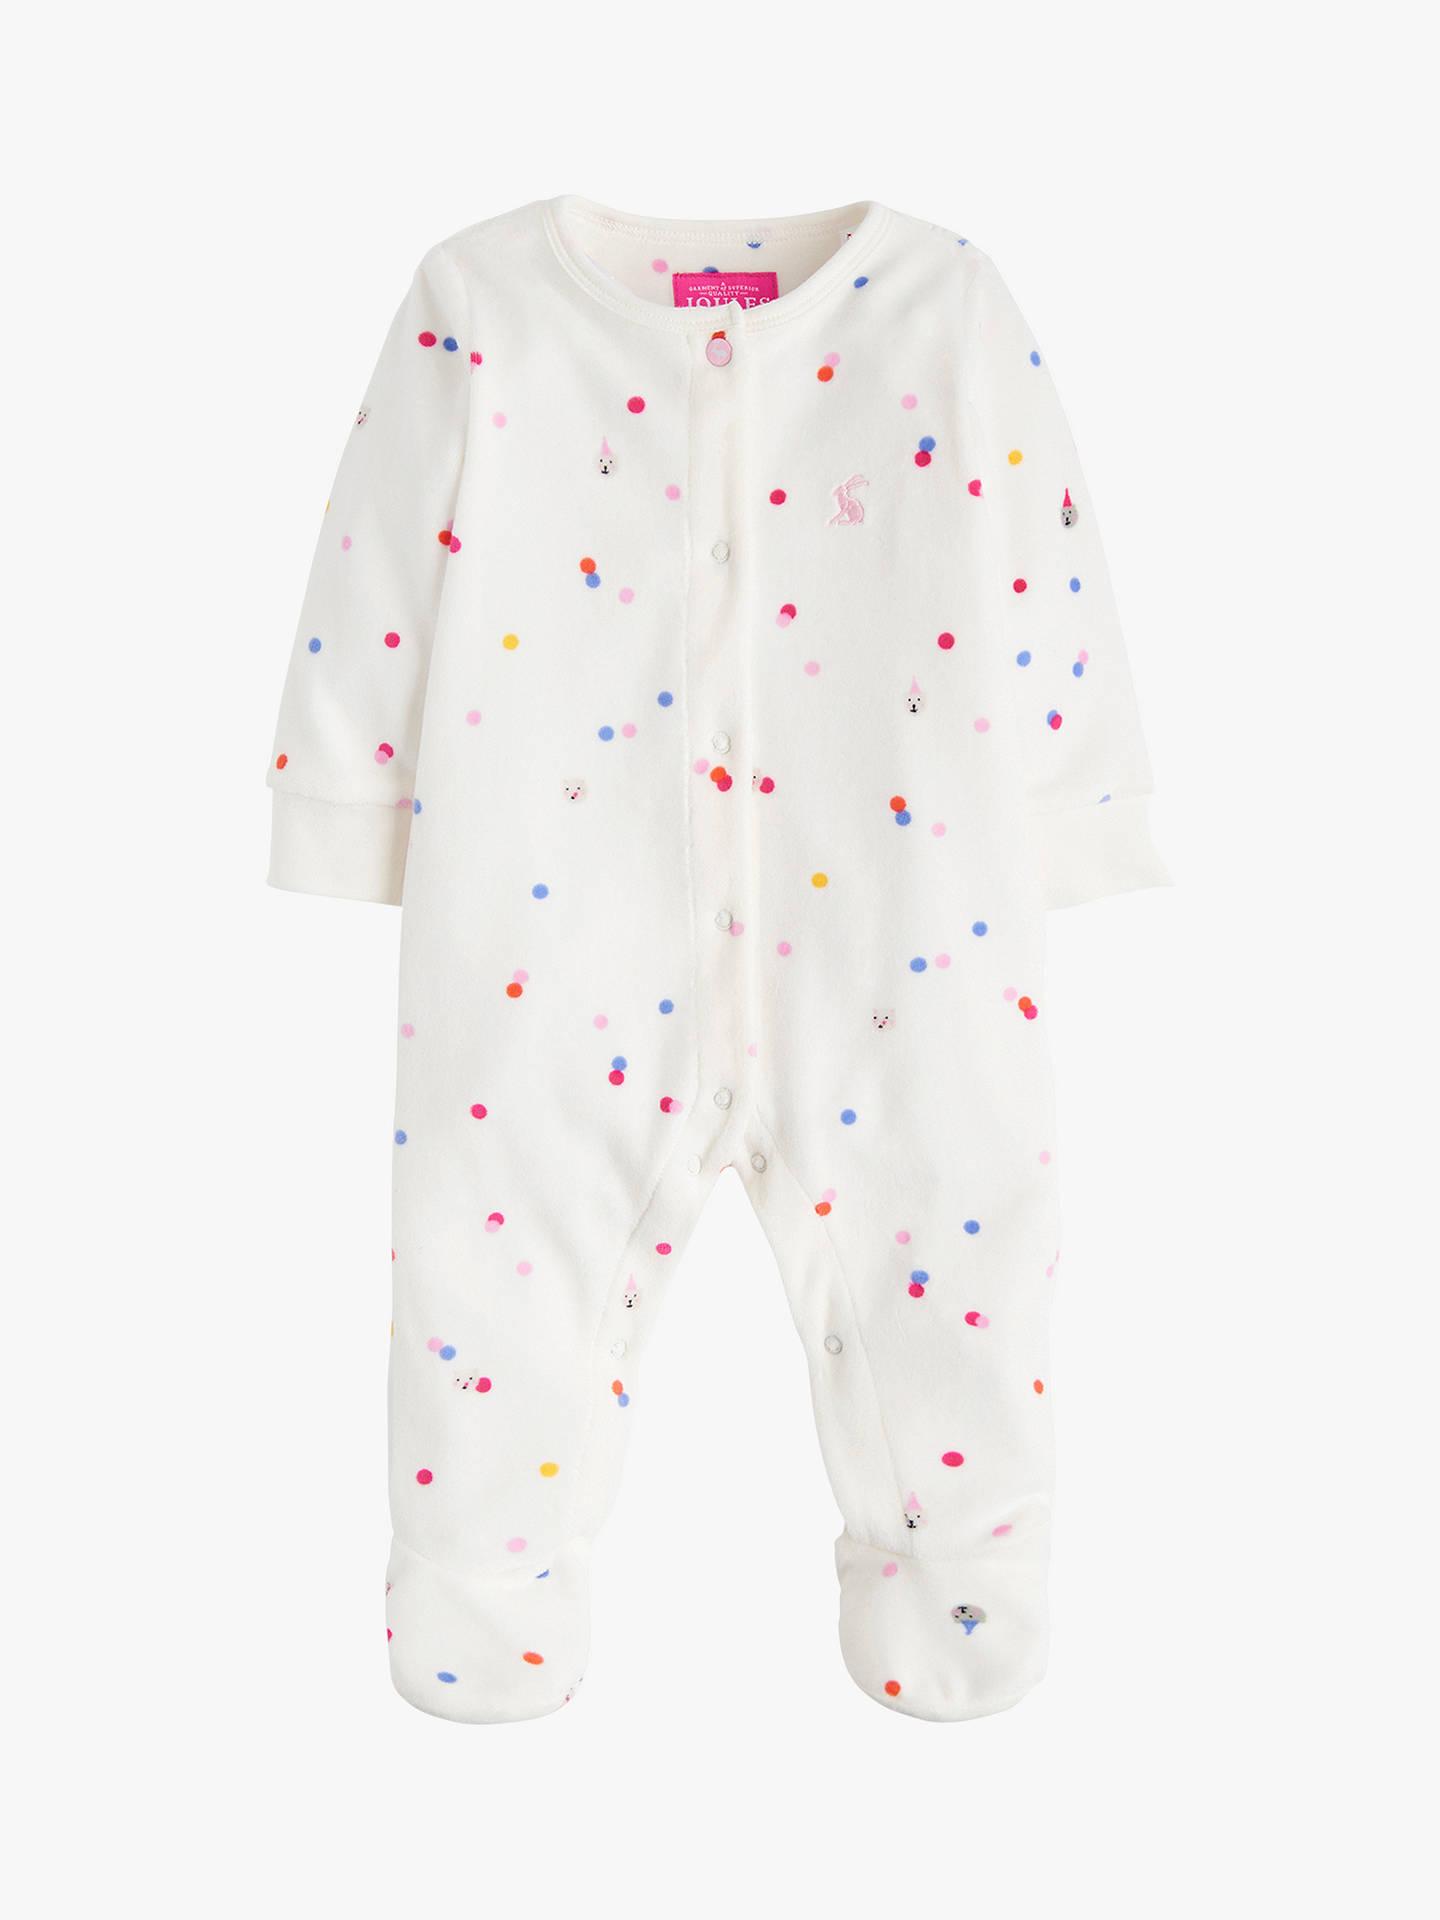 aa5f441a75f3 Baby Joule Cosmo Velour Sleepsuit